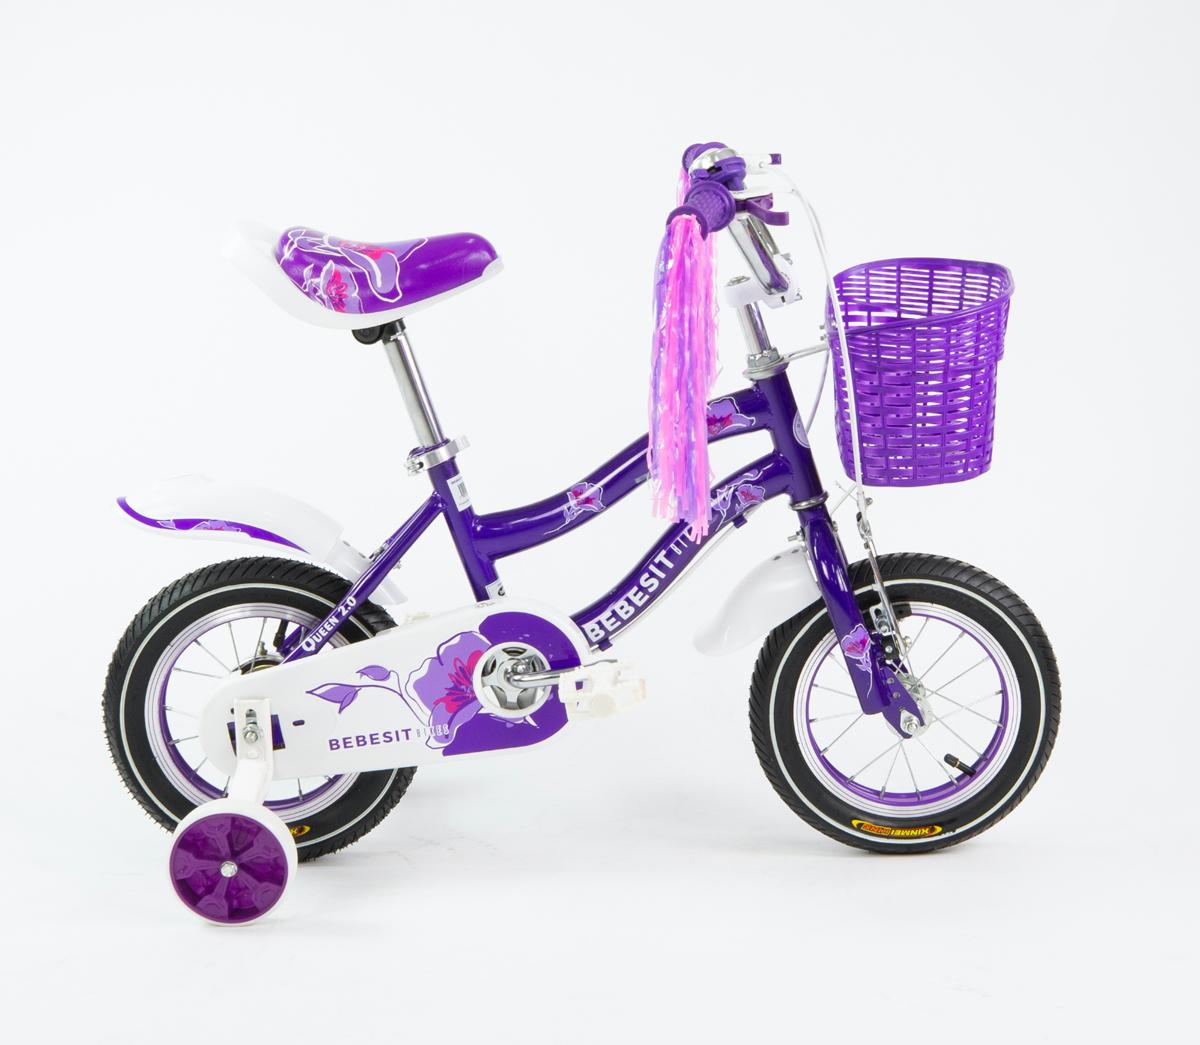 BEBESIT Bicicleta Queen rd 12 Violeta